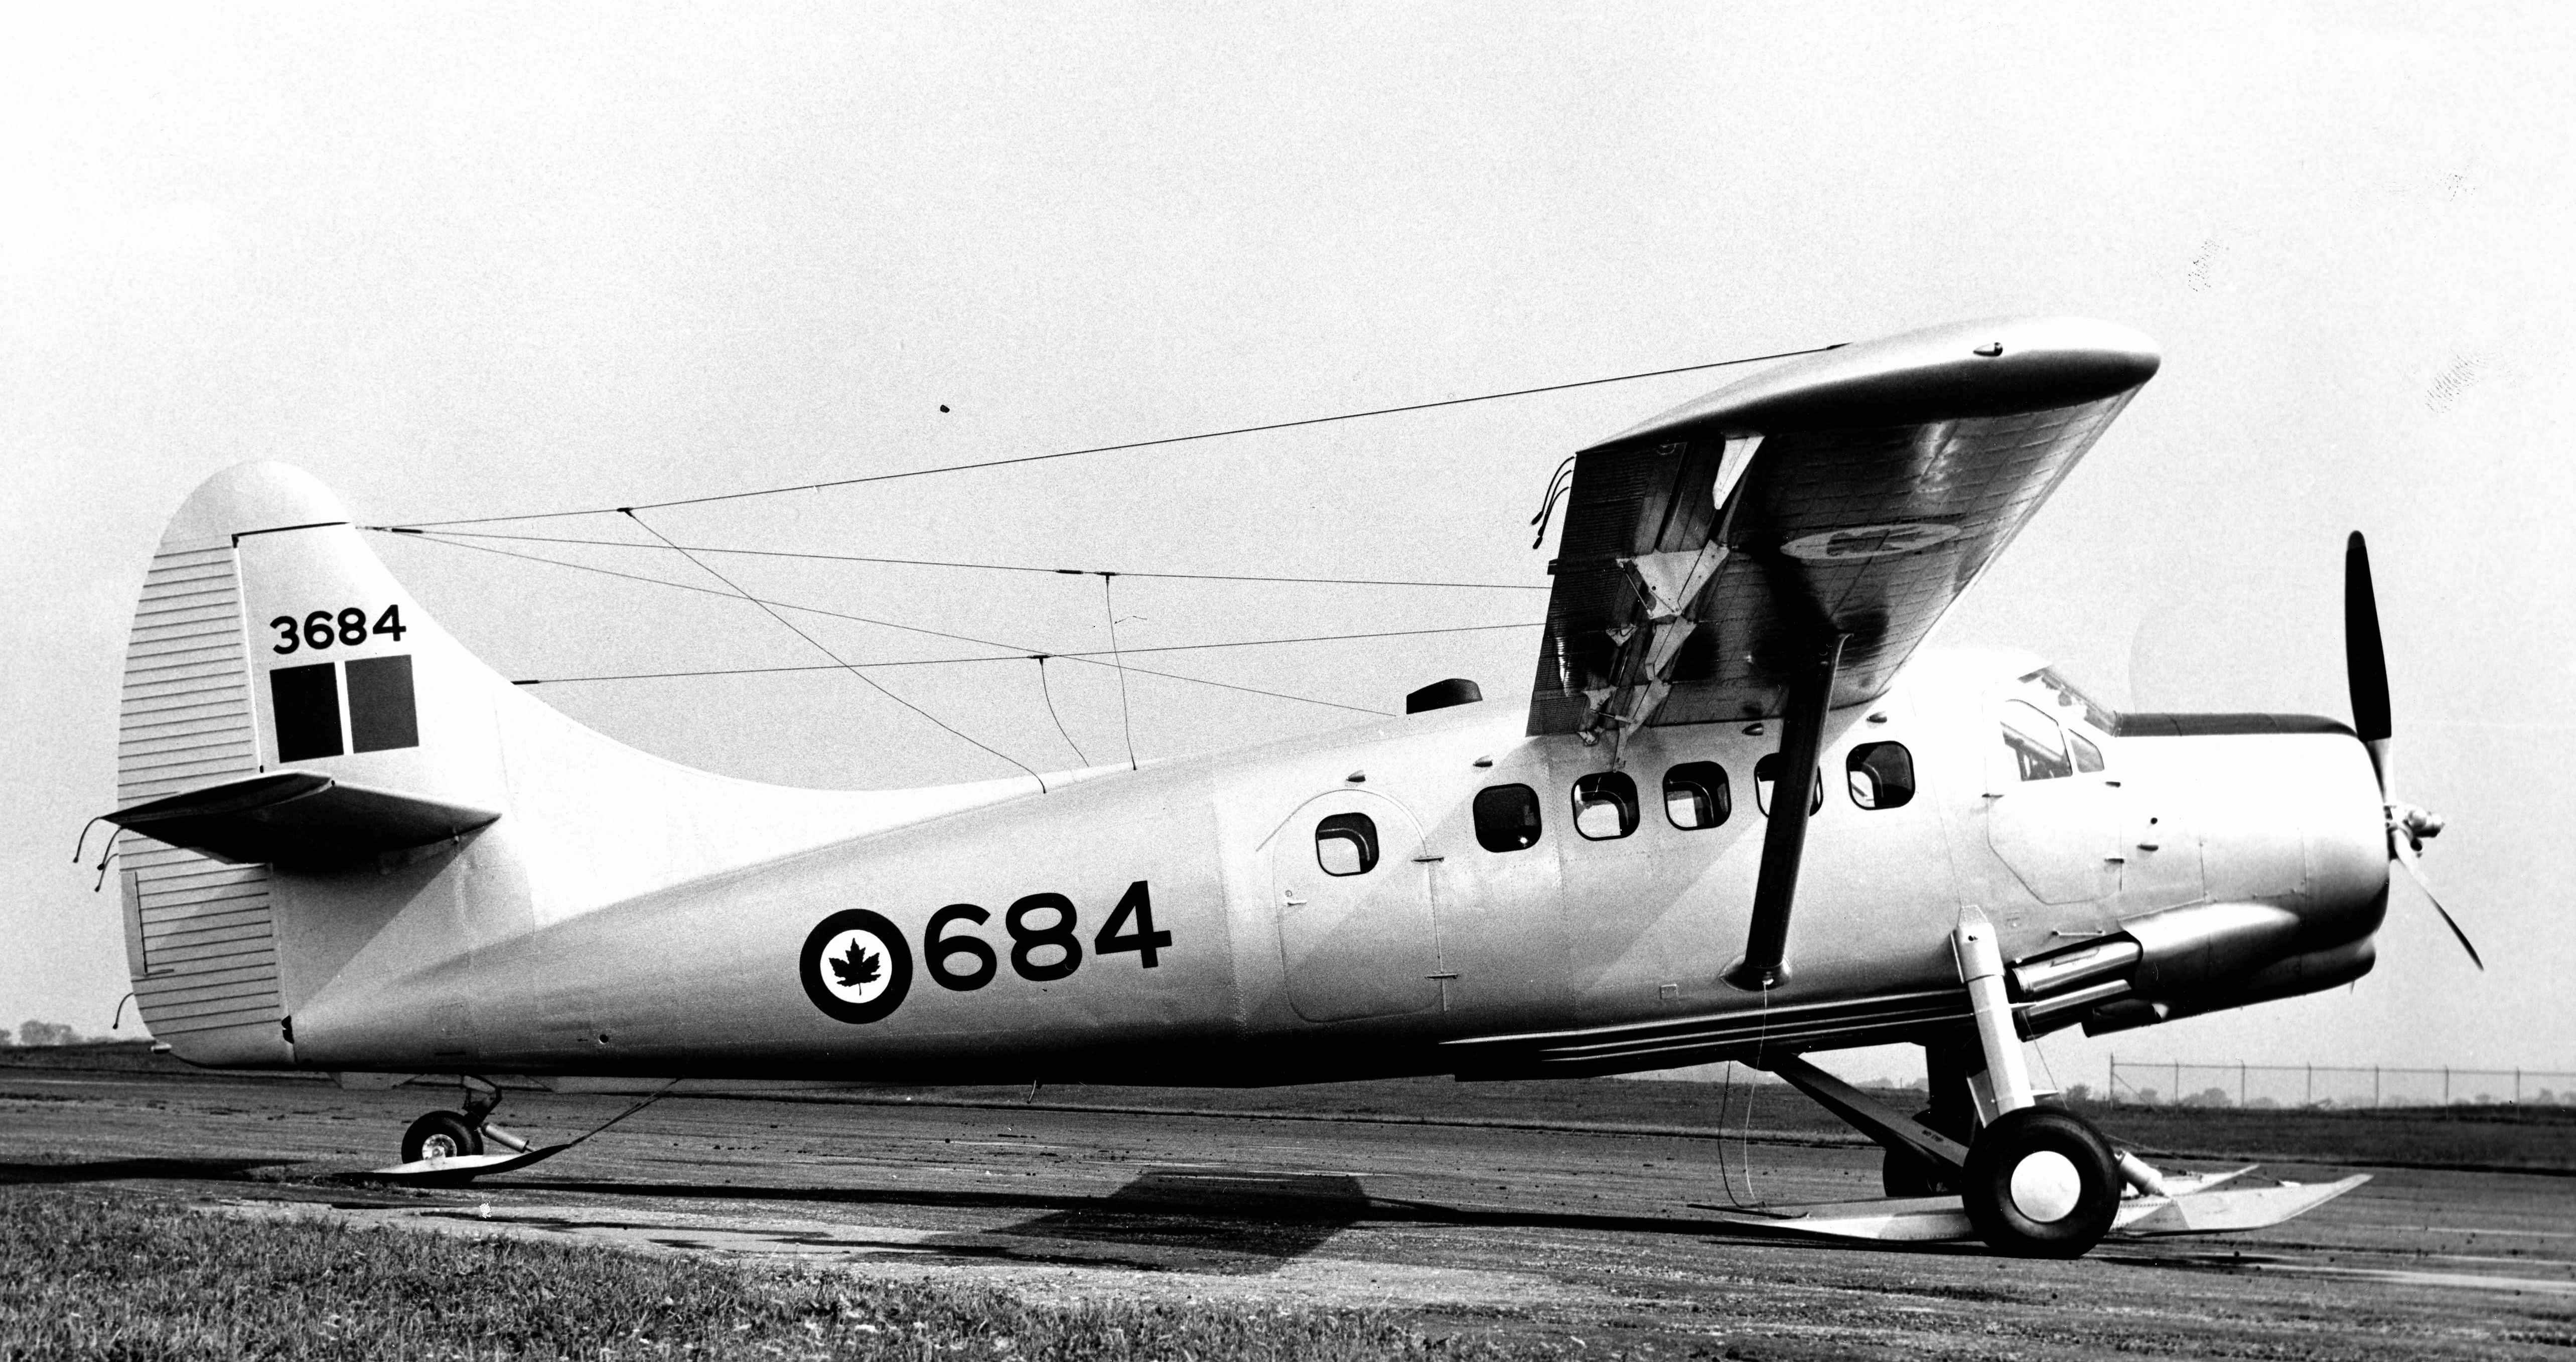 BLOG 25 HALFORD DHC Files 2-2019 Otter RCAF 3684 wheel_skis